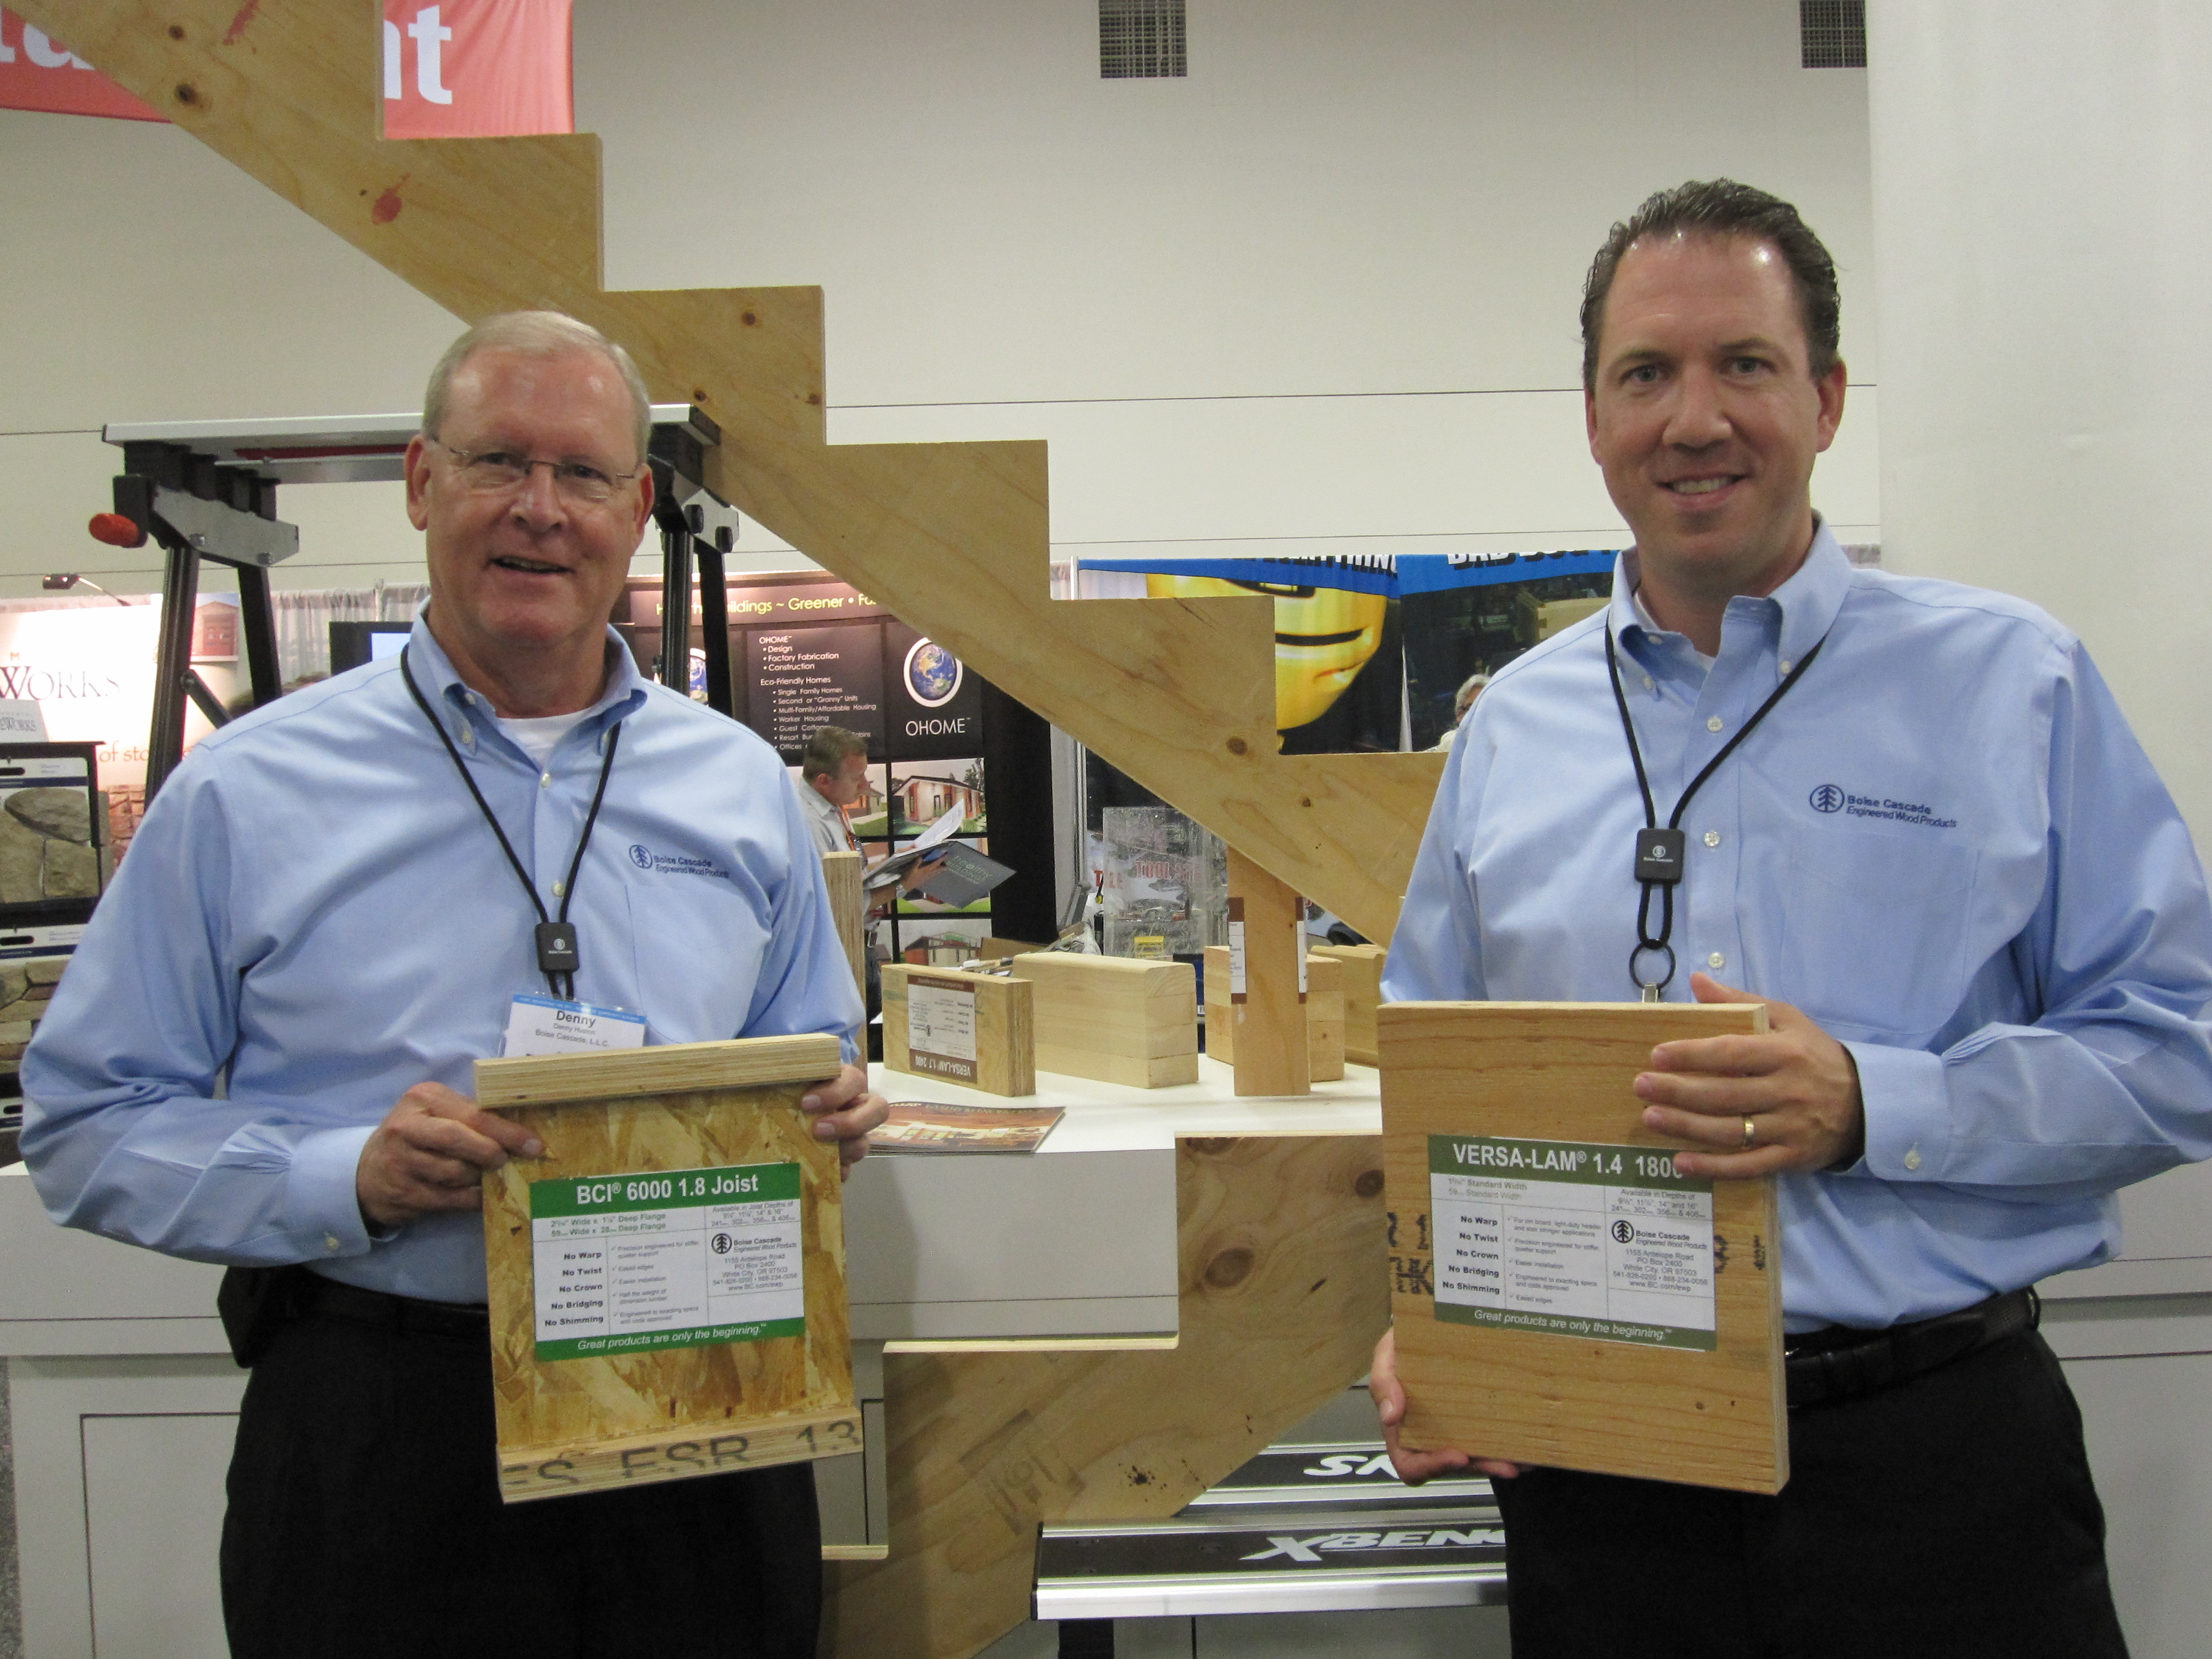 Boise Cascade Building Materials Distribution Llc